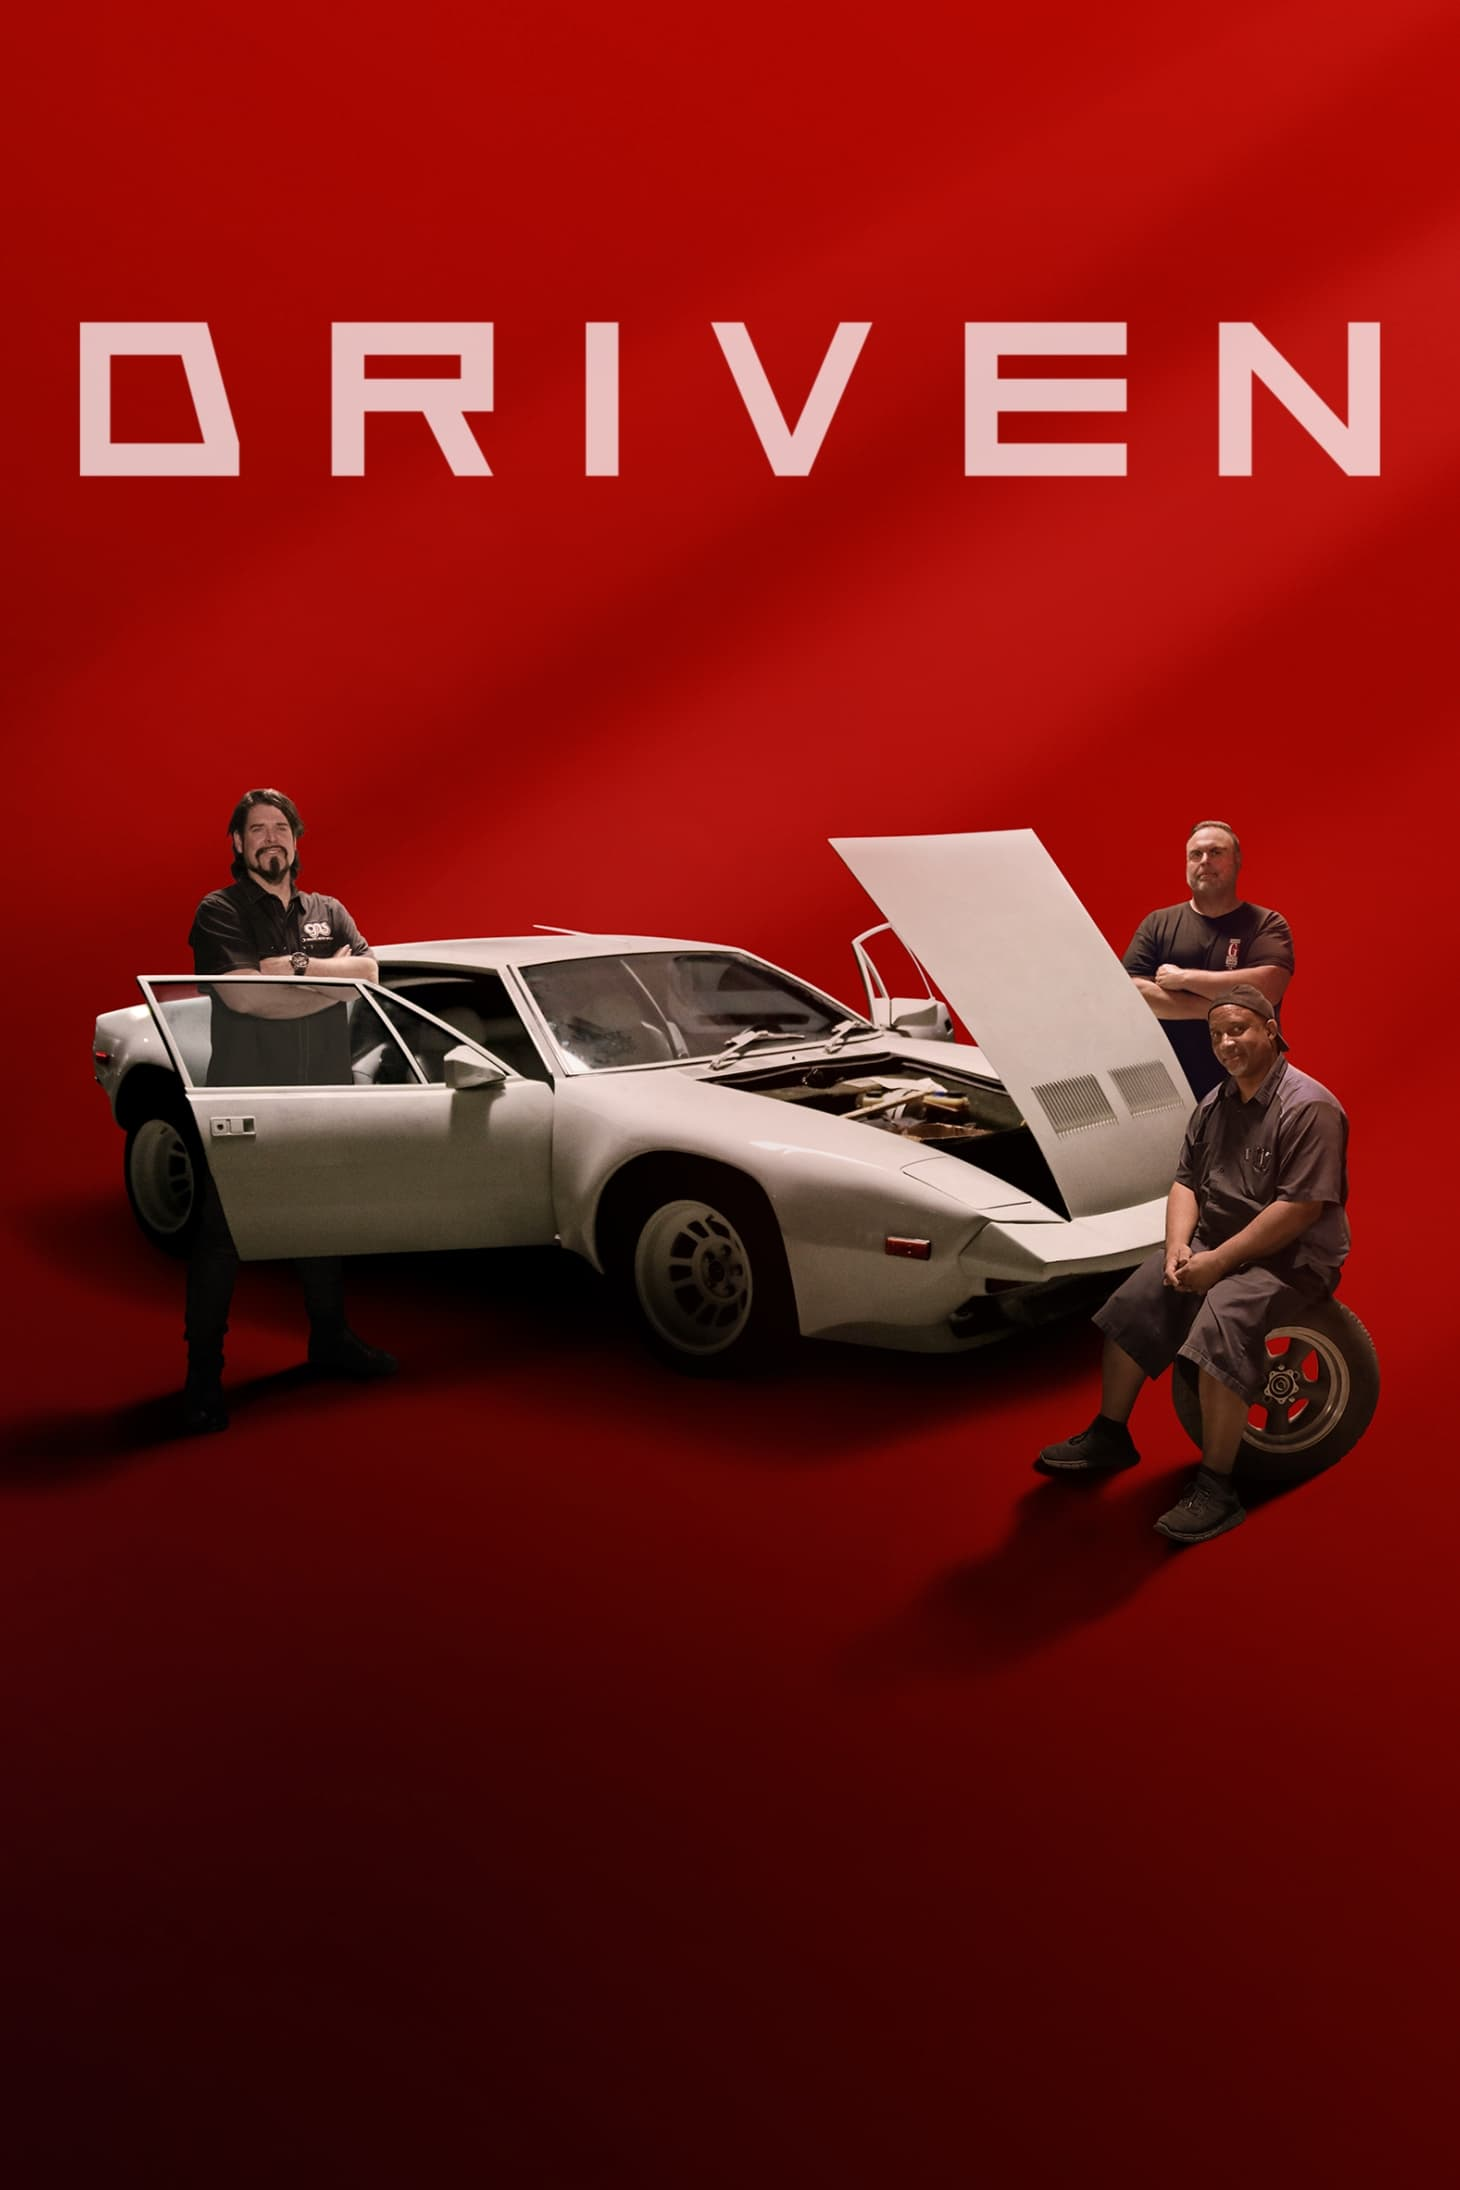 Driven (2020)